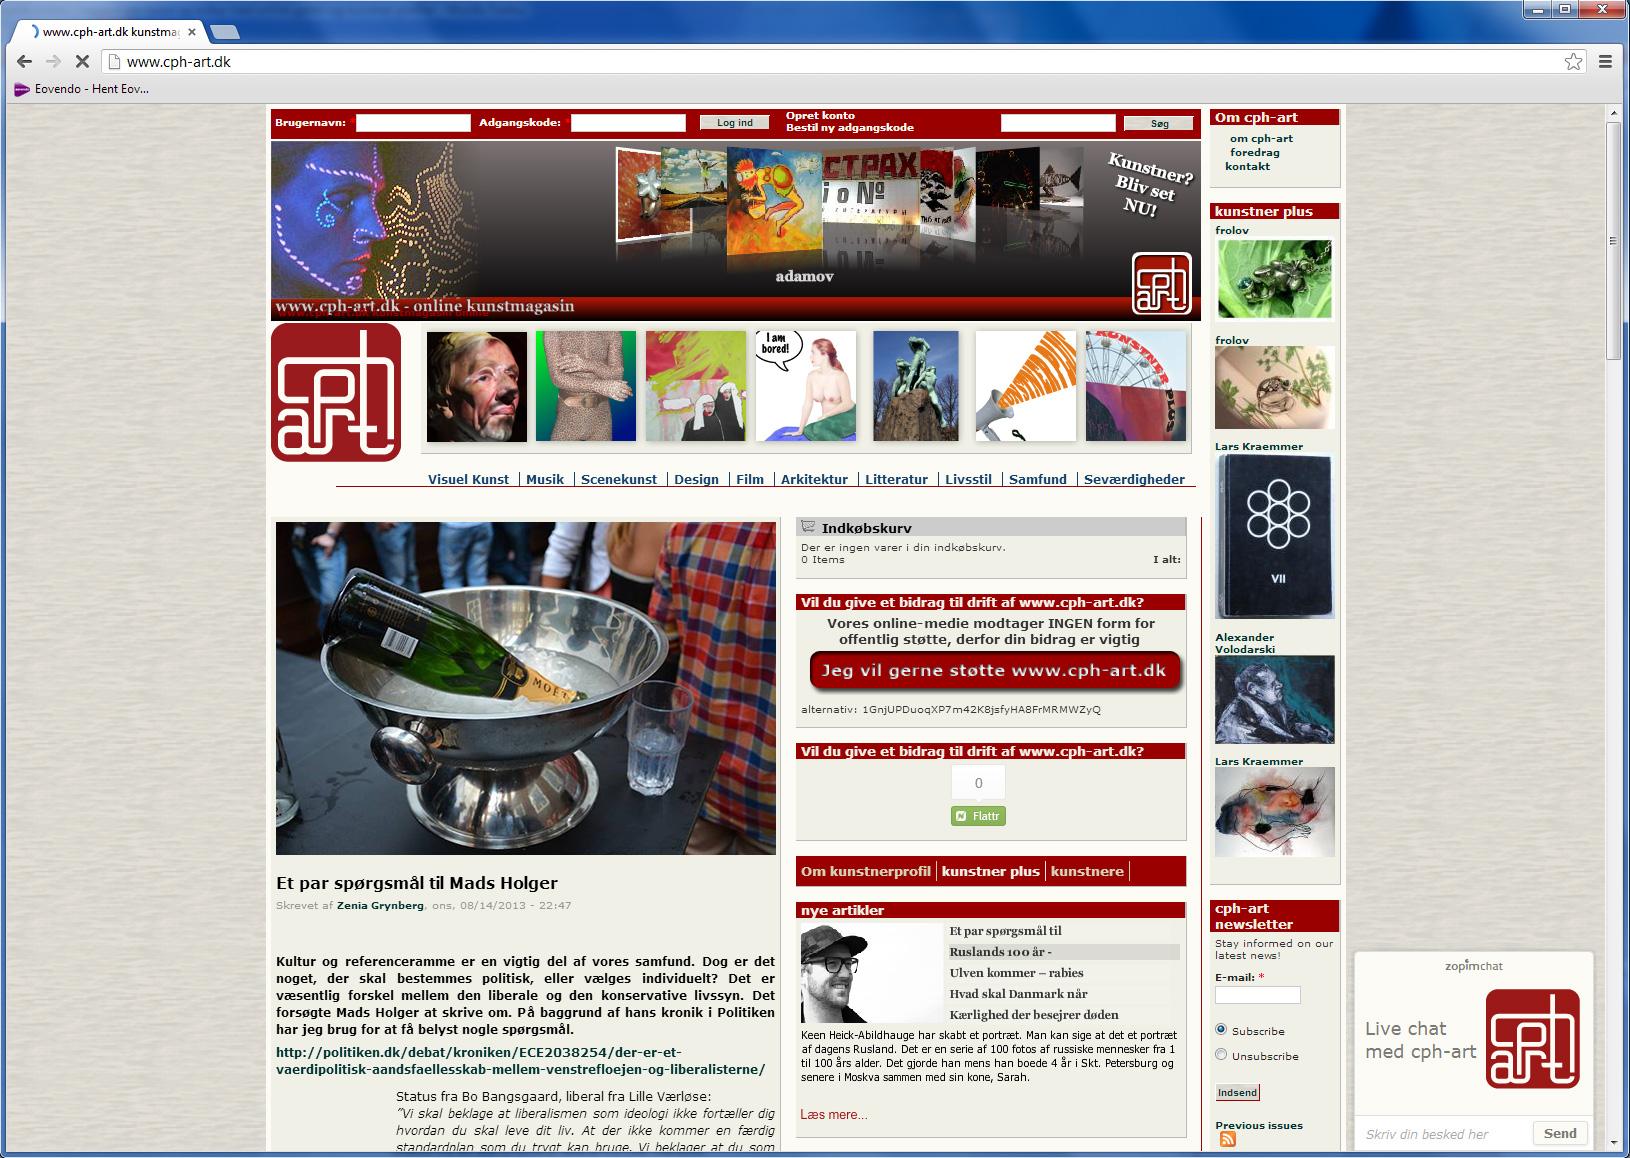 cph-art.dk - online kunstmagasin med kunstnerprofiler, betalingssysten, blogs, gallerier, forum mm